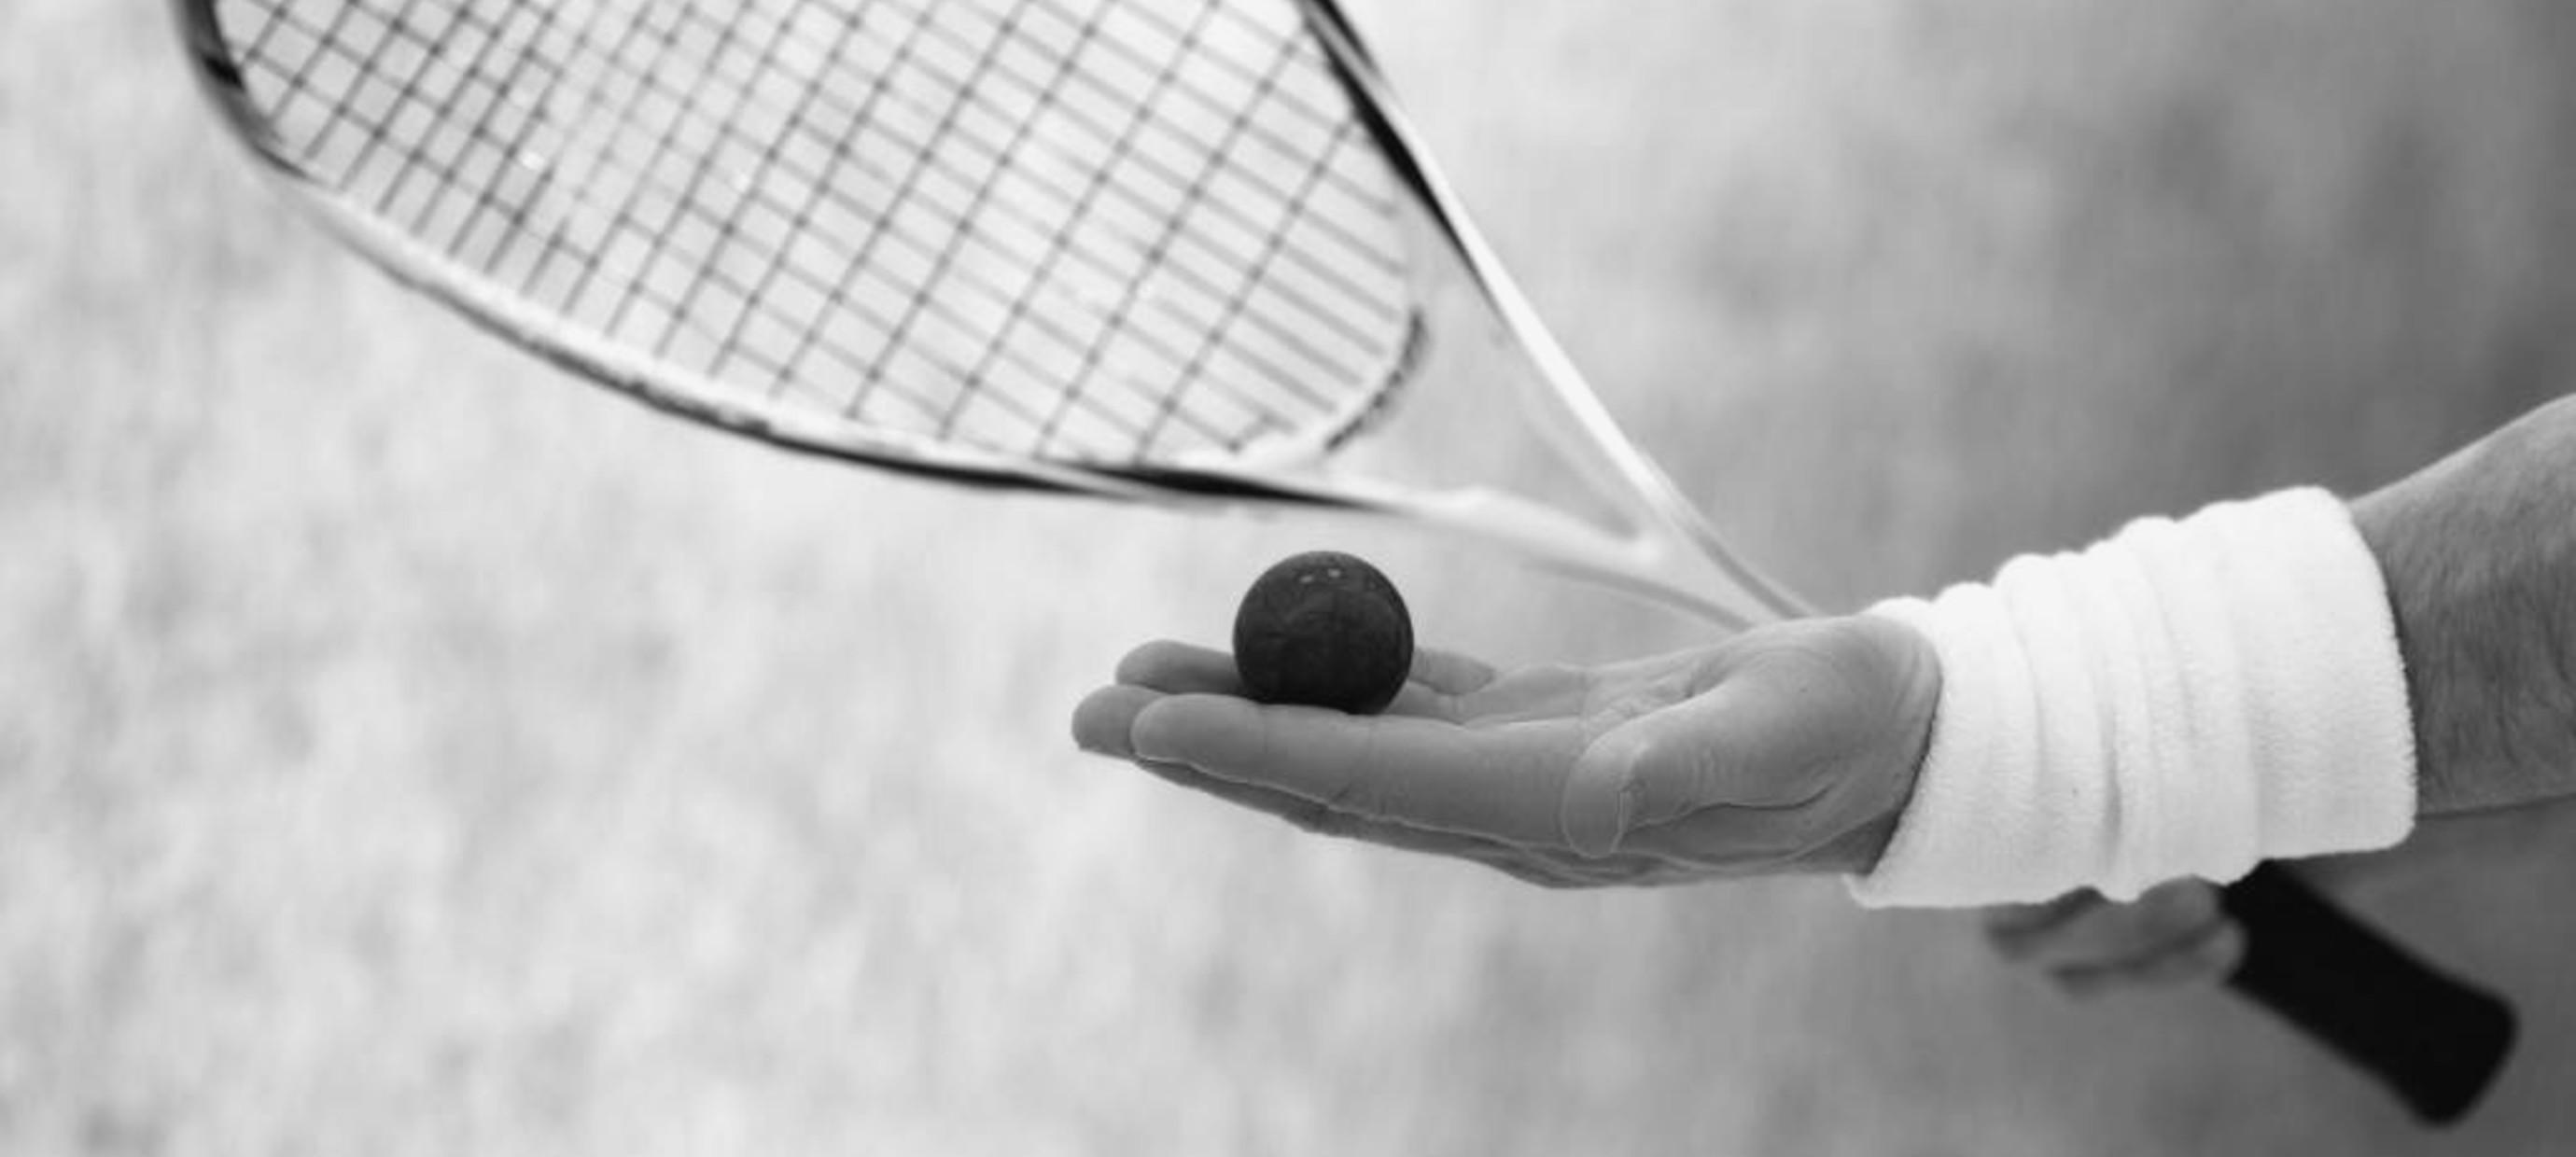 The advantages of a light squash racket